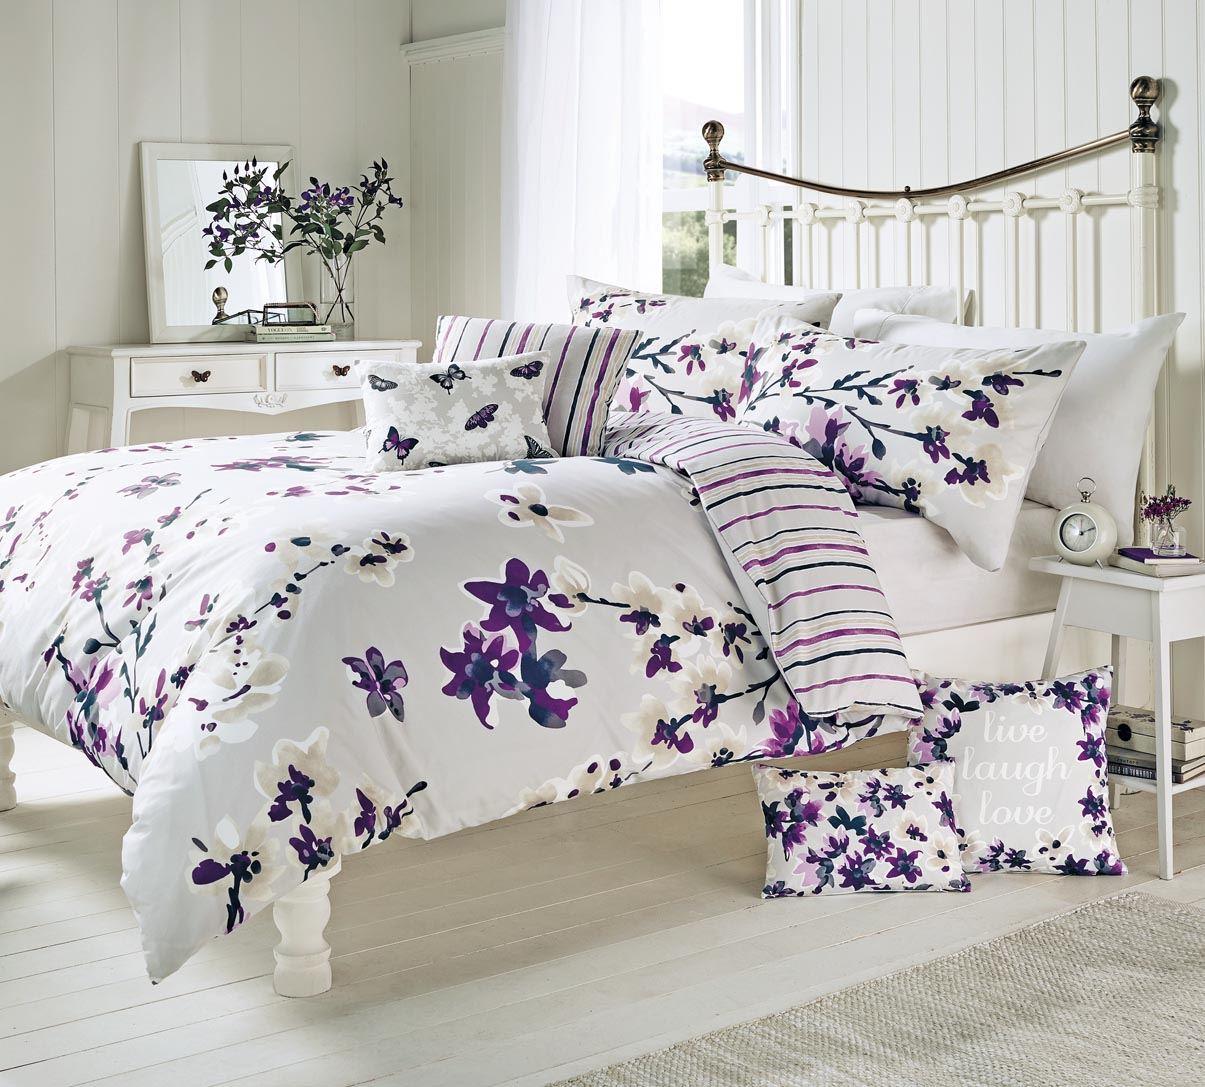 sakura floral duvet cover quilt set mauve purple single double  - a superior printed duvet cover set with a unique floral pattern designedand made by dreams n drapes single quilt set includes a pillowcase whiledouble